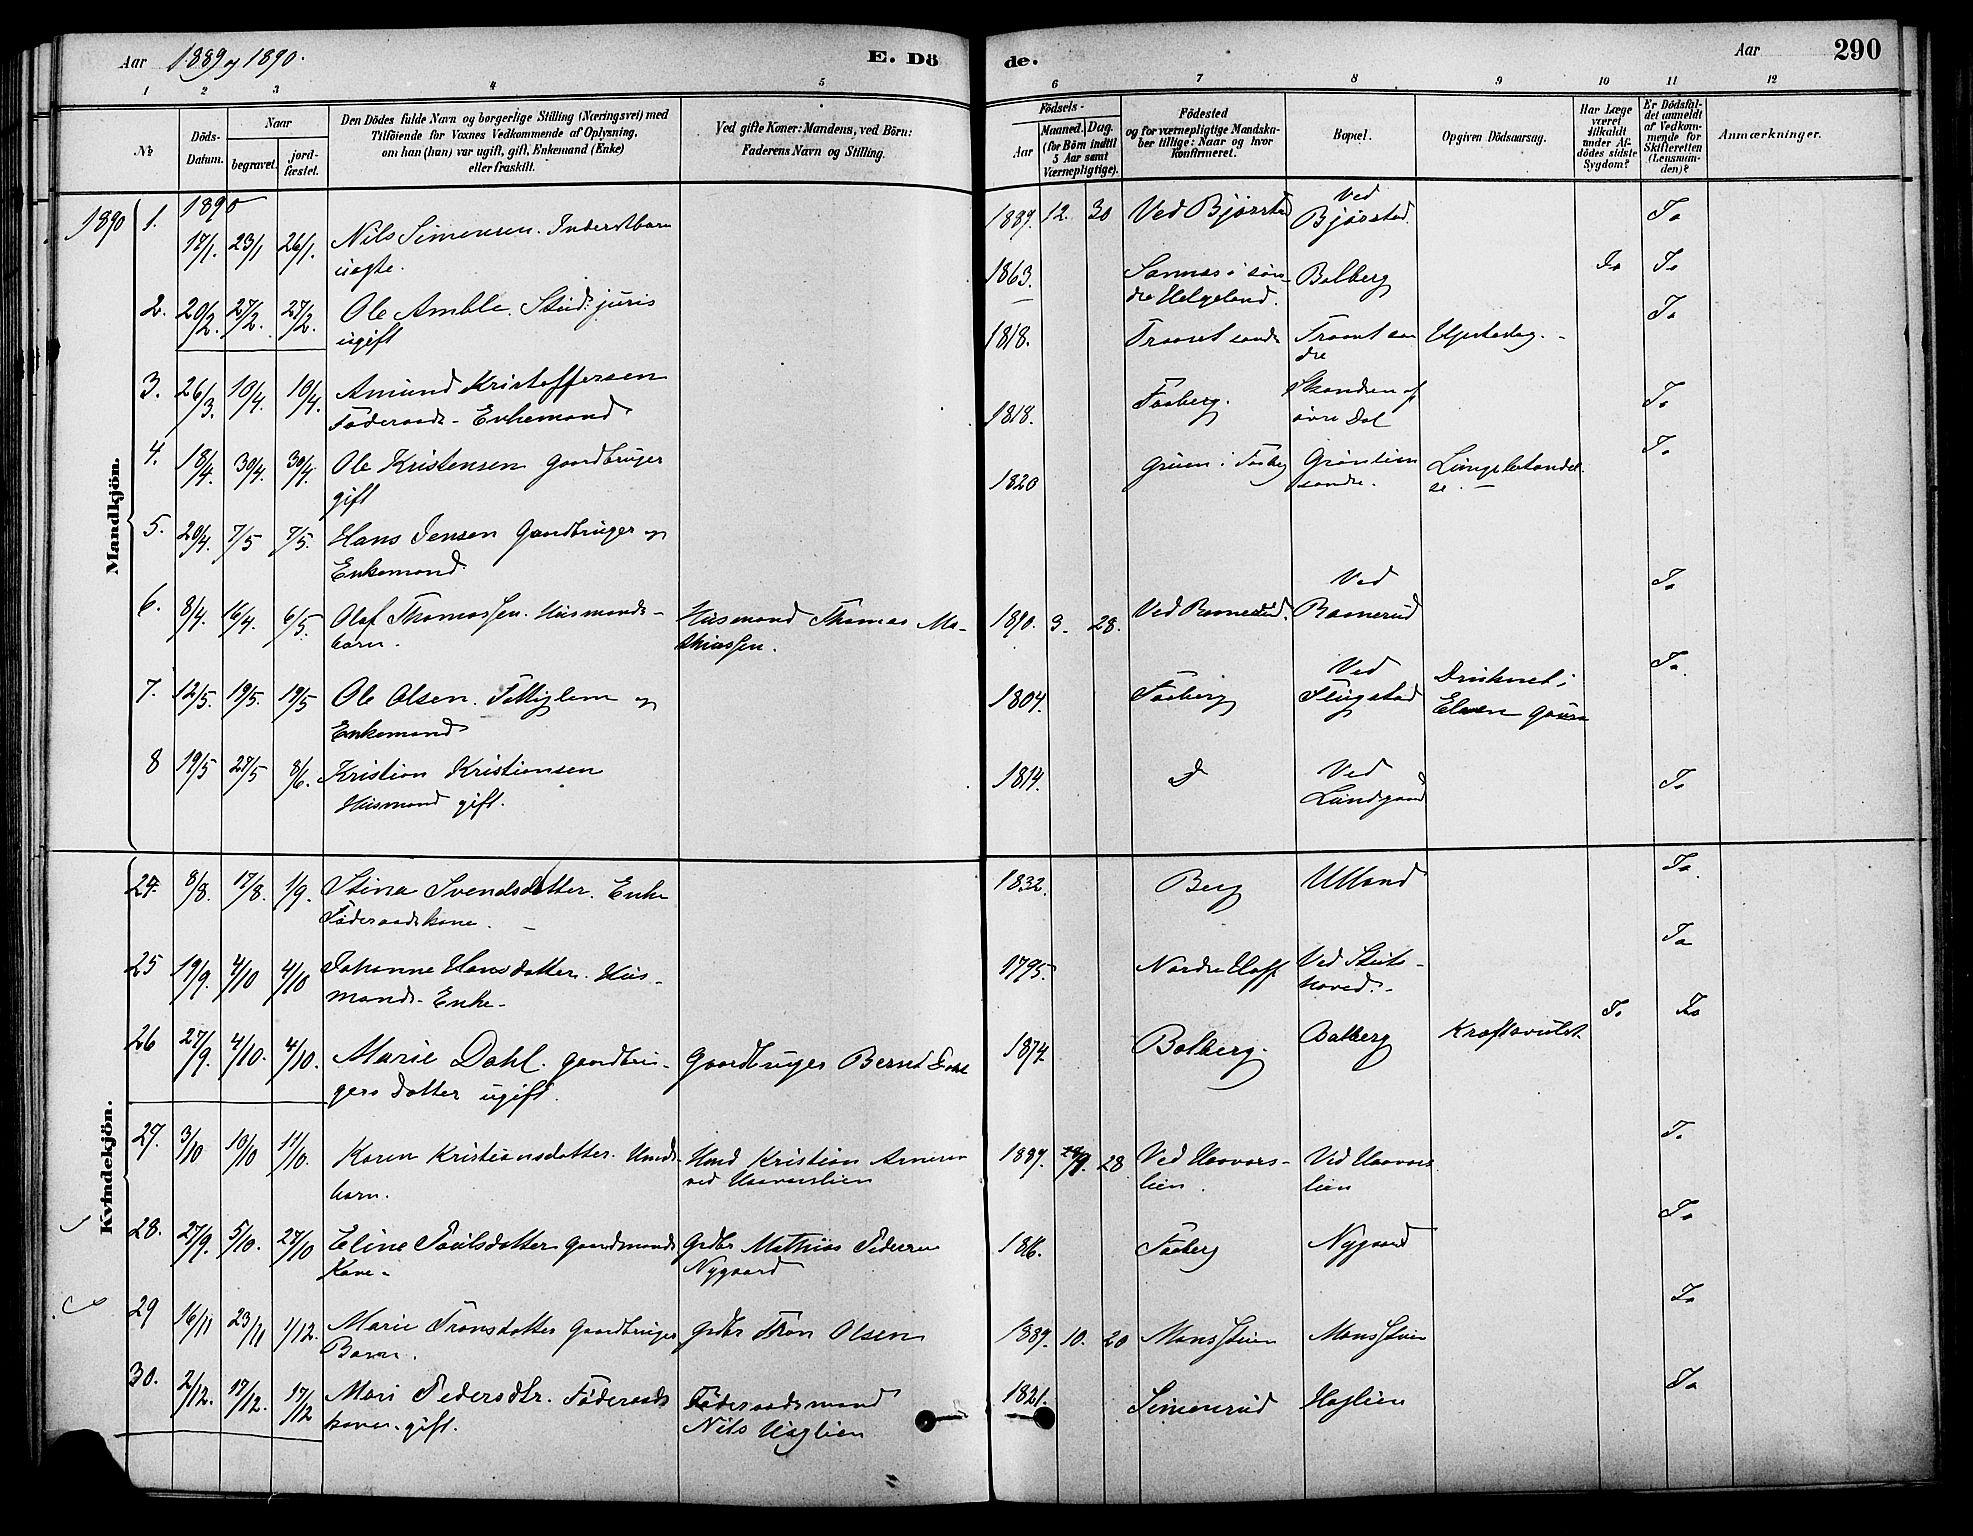 SAH, Fåberg prestekontor, Ministerialbok nr. 8, 1879-1898, s. 290